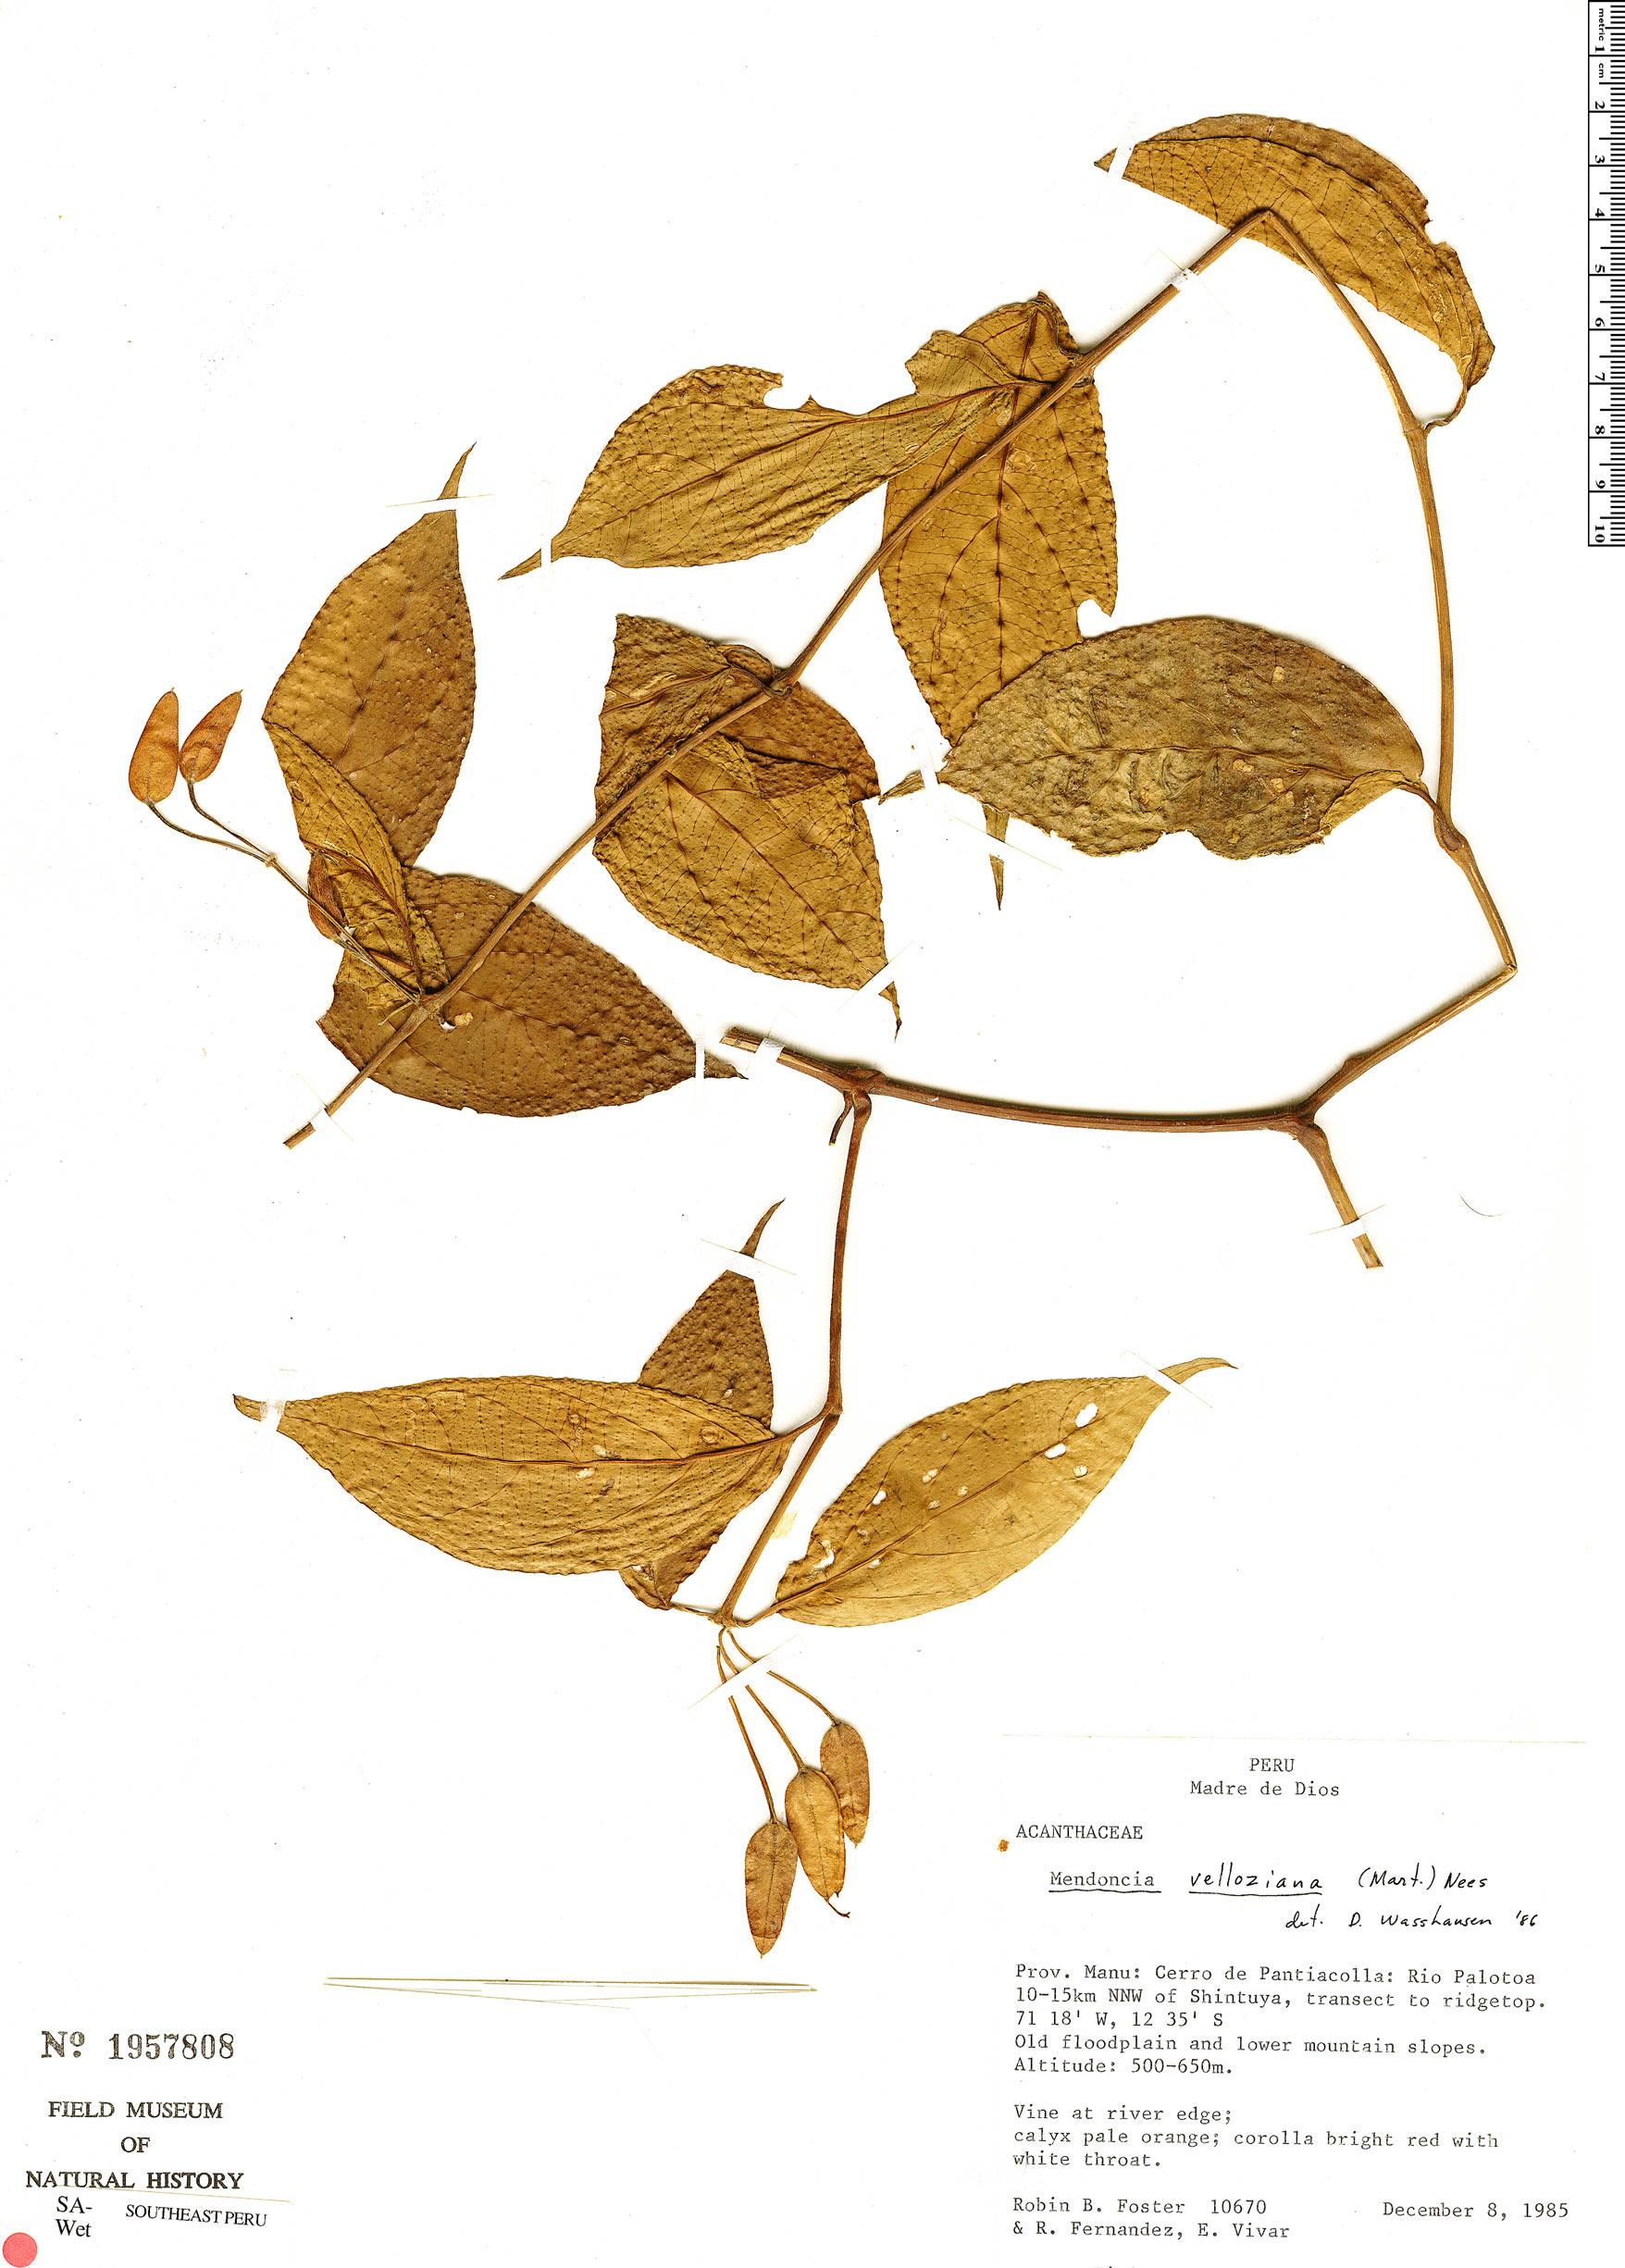 Specimen: Mendoncia velloziana